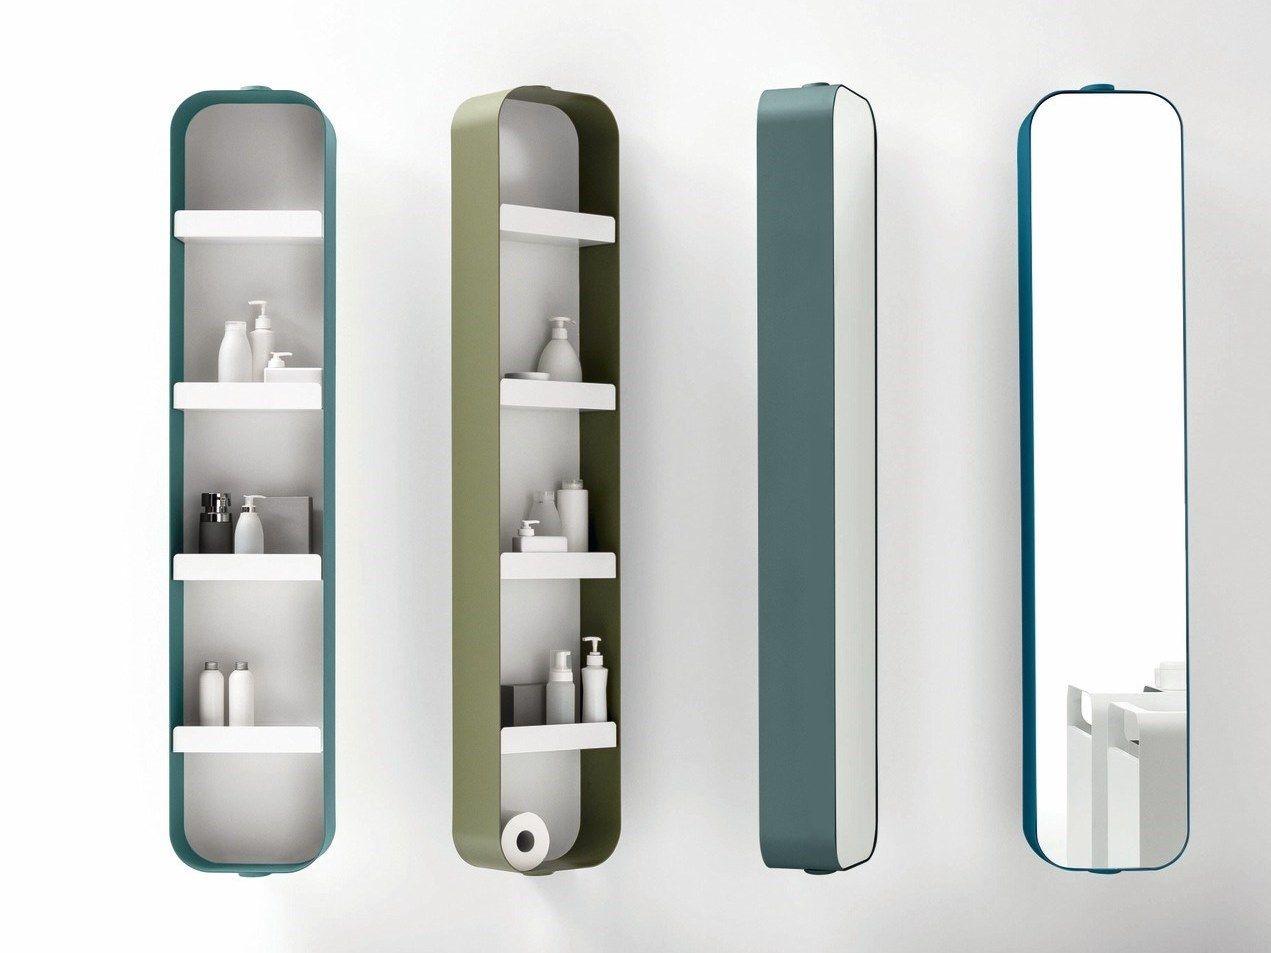 Meuble Haut Salle De Bain Avec Miroir tulip | meuble pour salle de bain avec miroirarblu in 2020